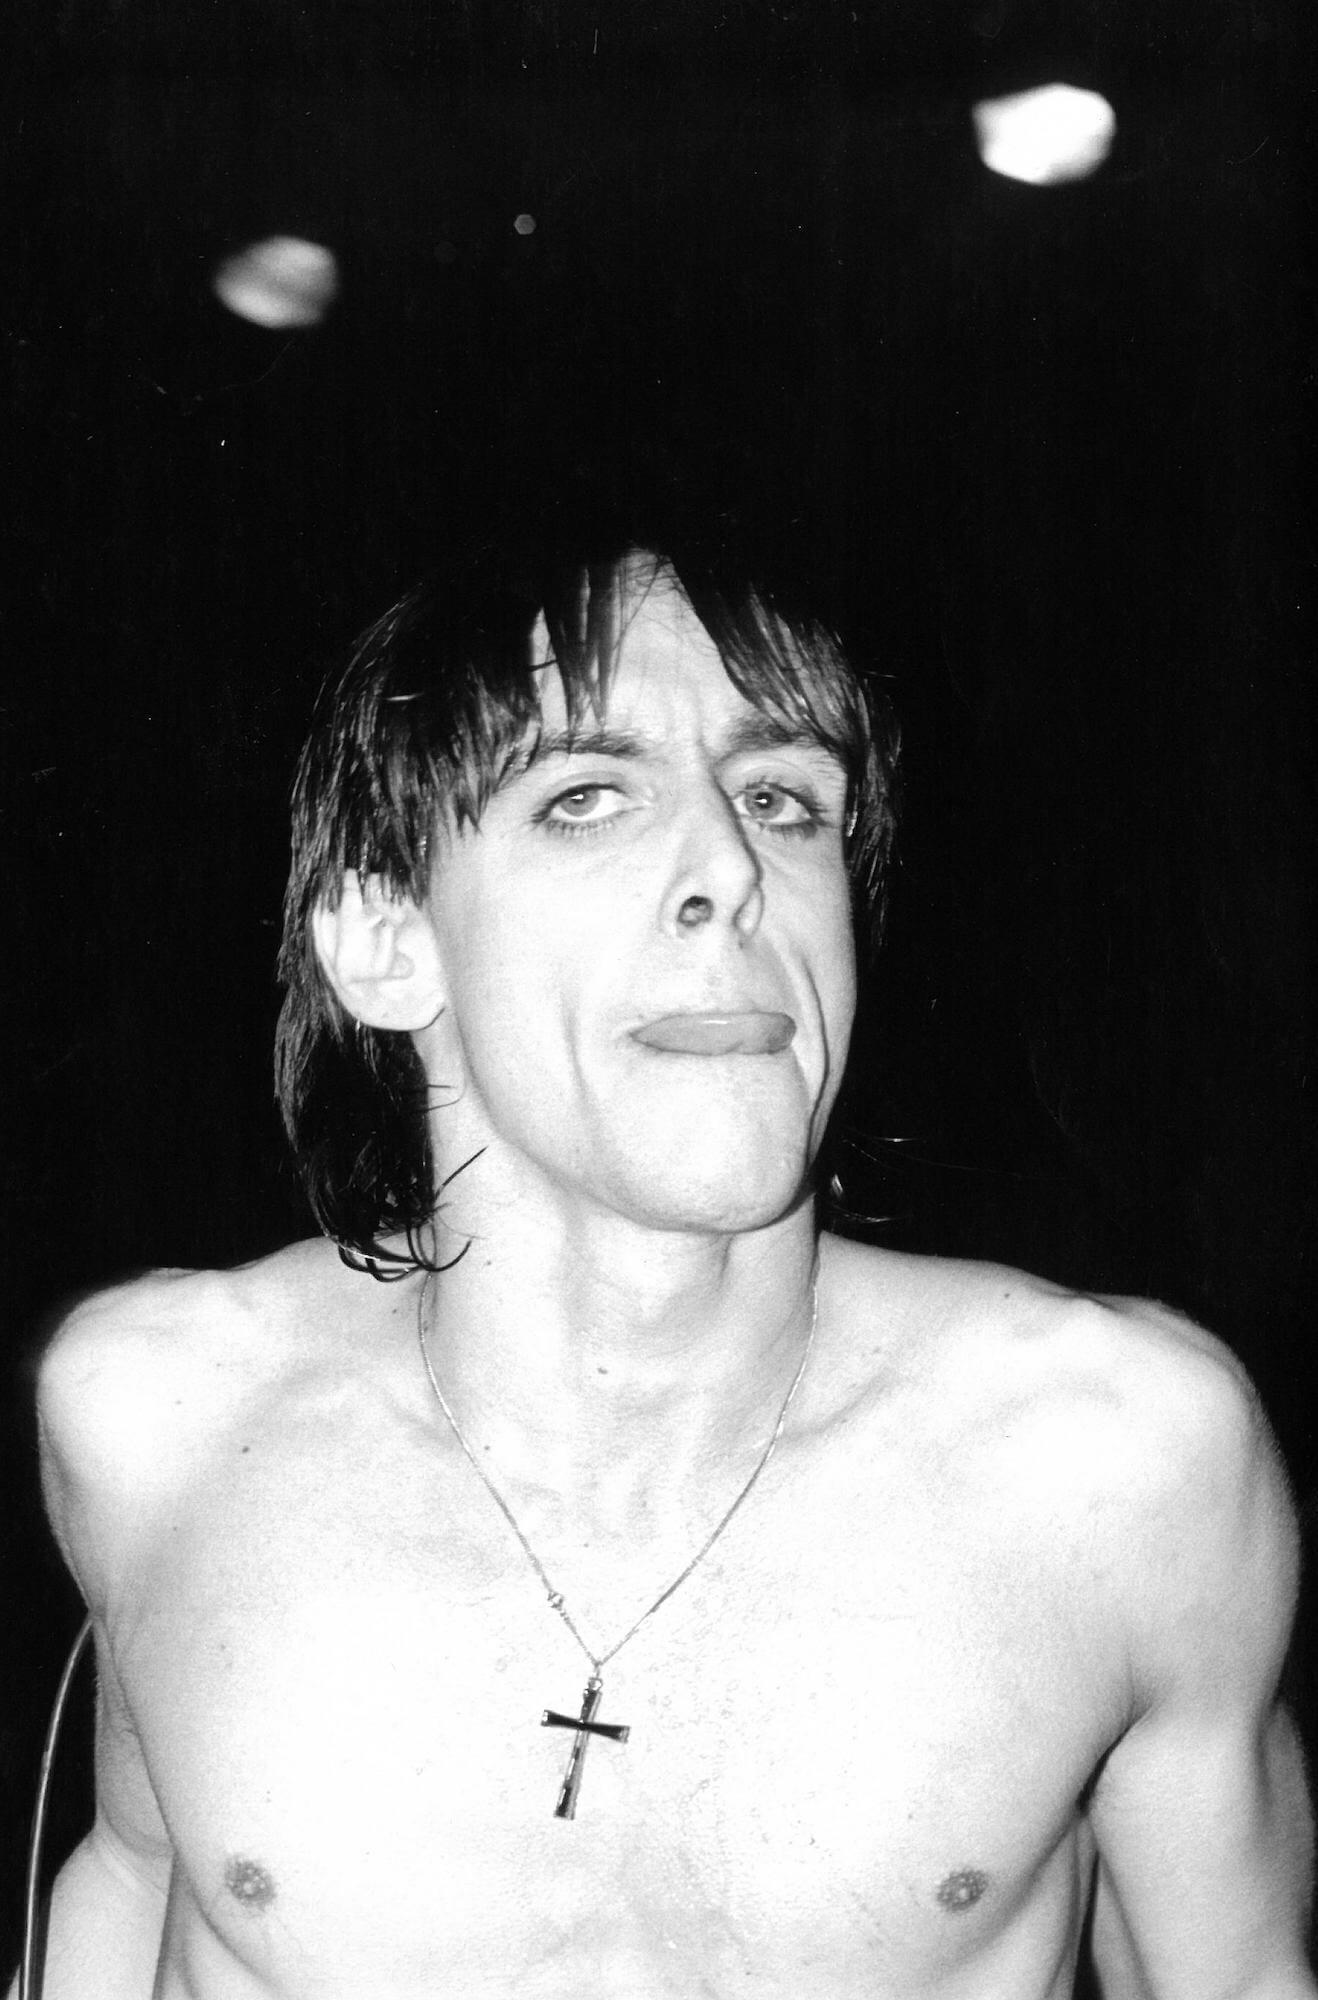 Iggy Pop Performing at the Palladium, 1977